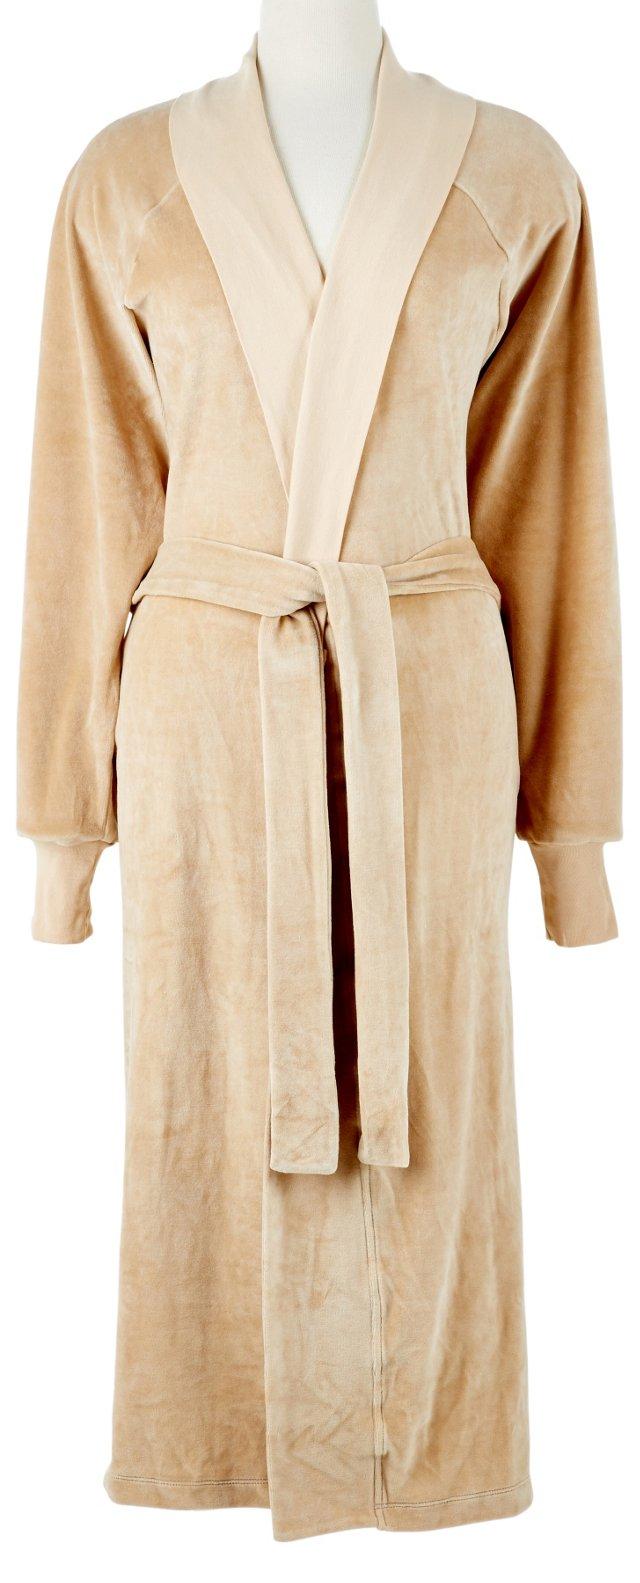 Organic Cotton Velour Robe, Barley